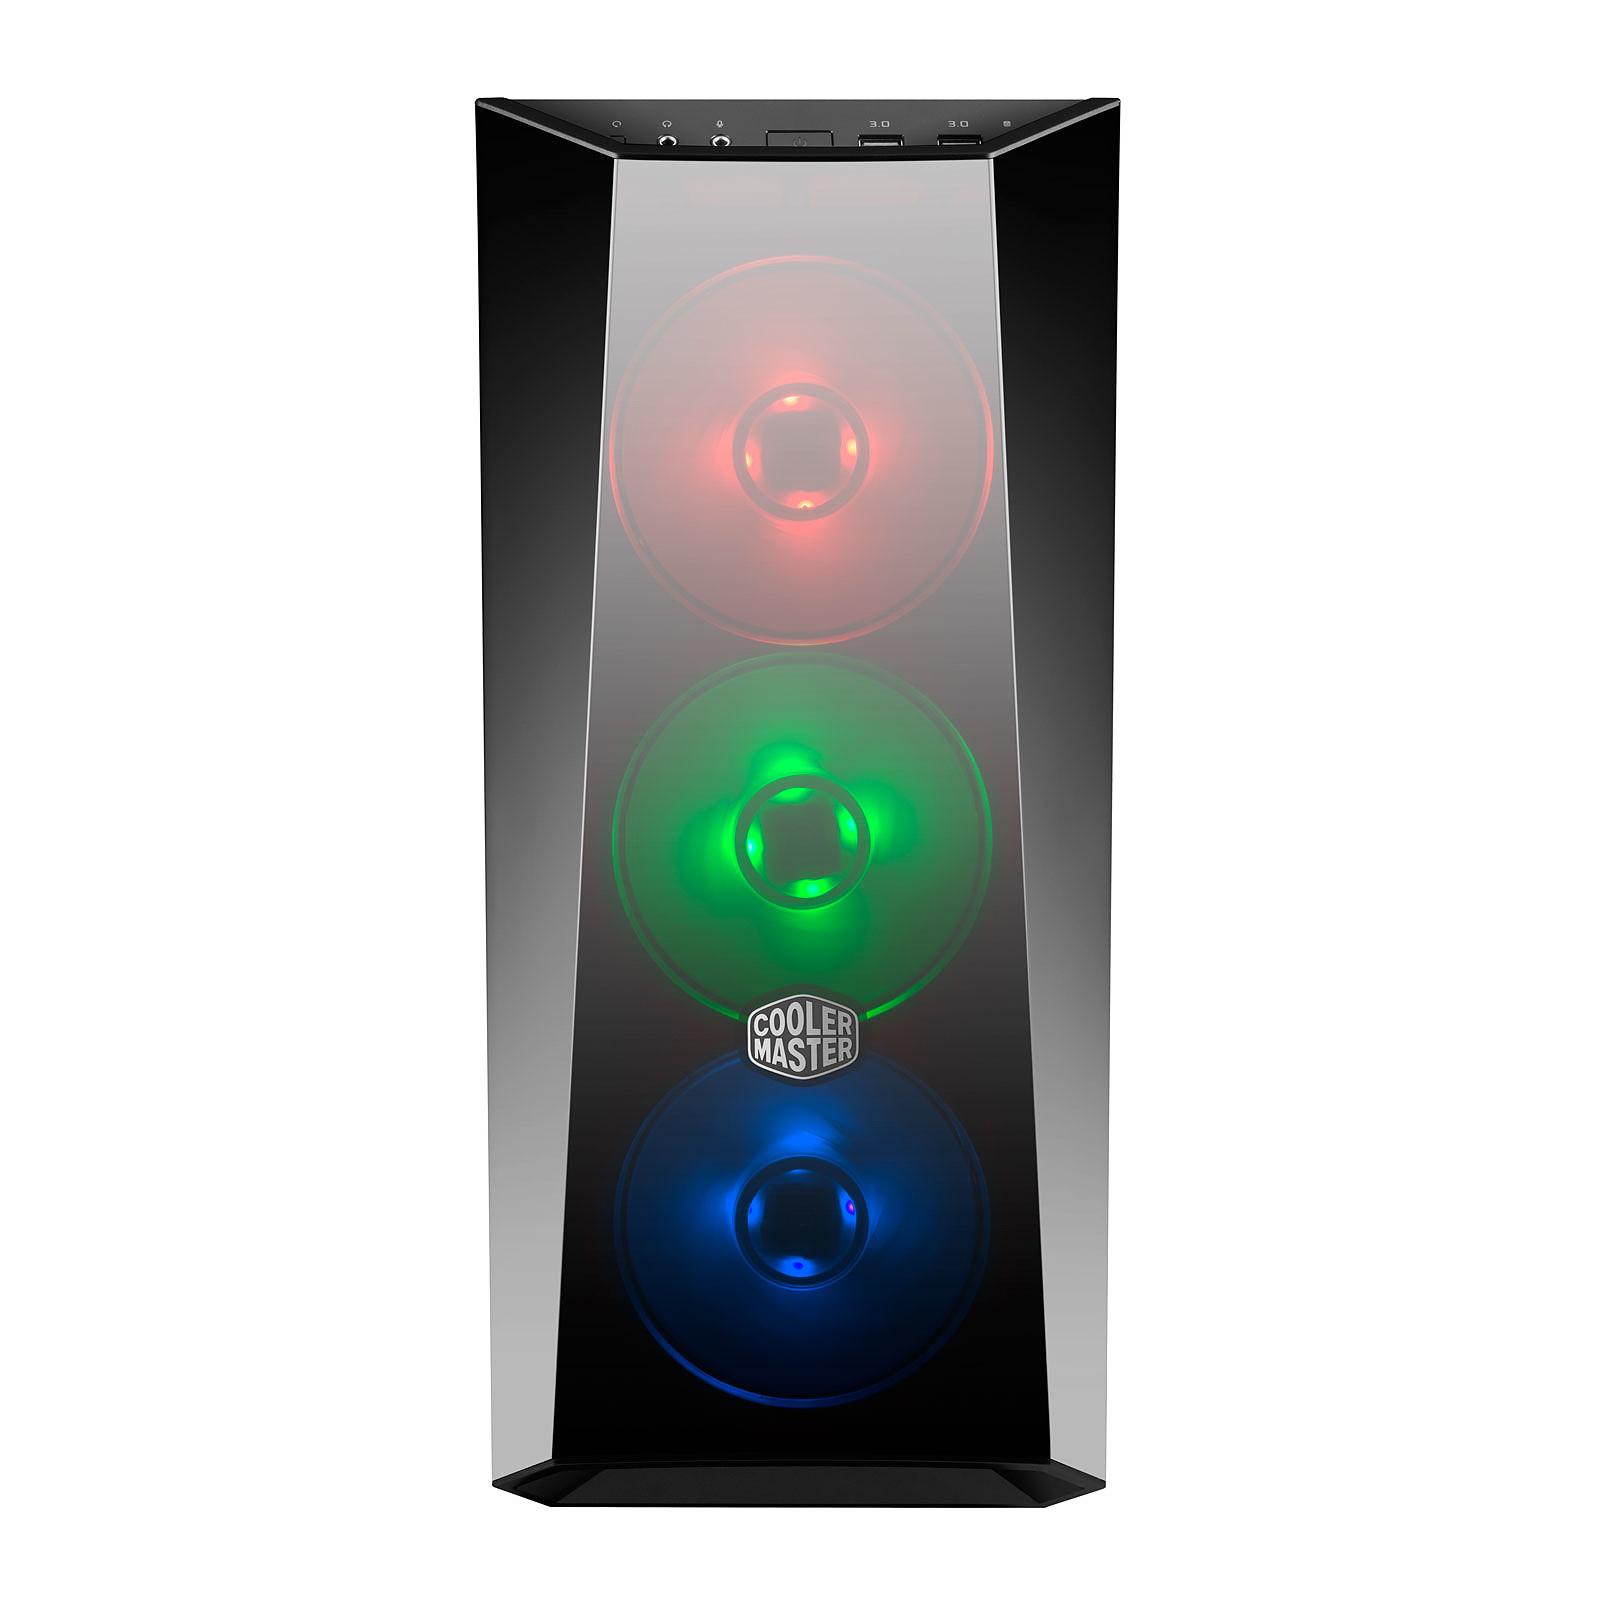 Boitier PC ATX, Micro-ATX, Mini-ITX Cooler Master MasterBox Lite 5 RGB avec fenêtre sans alim, informatique ile reunion, informatique reunion 974